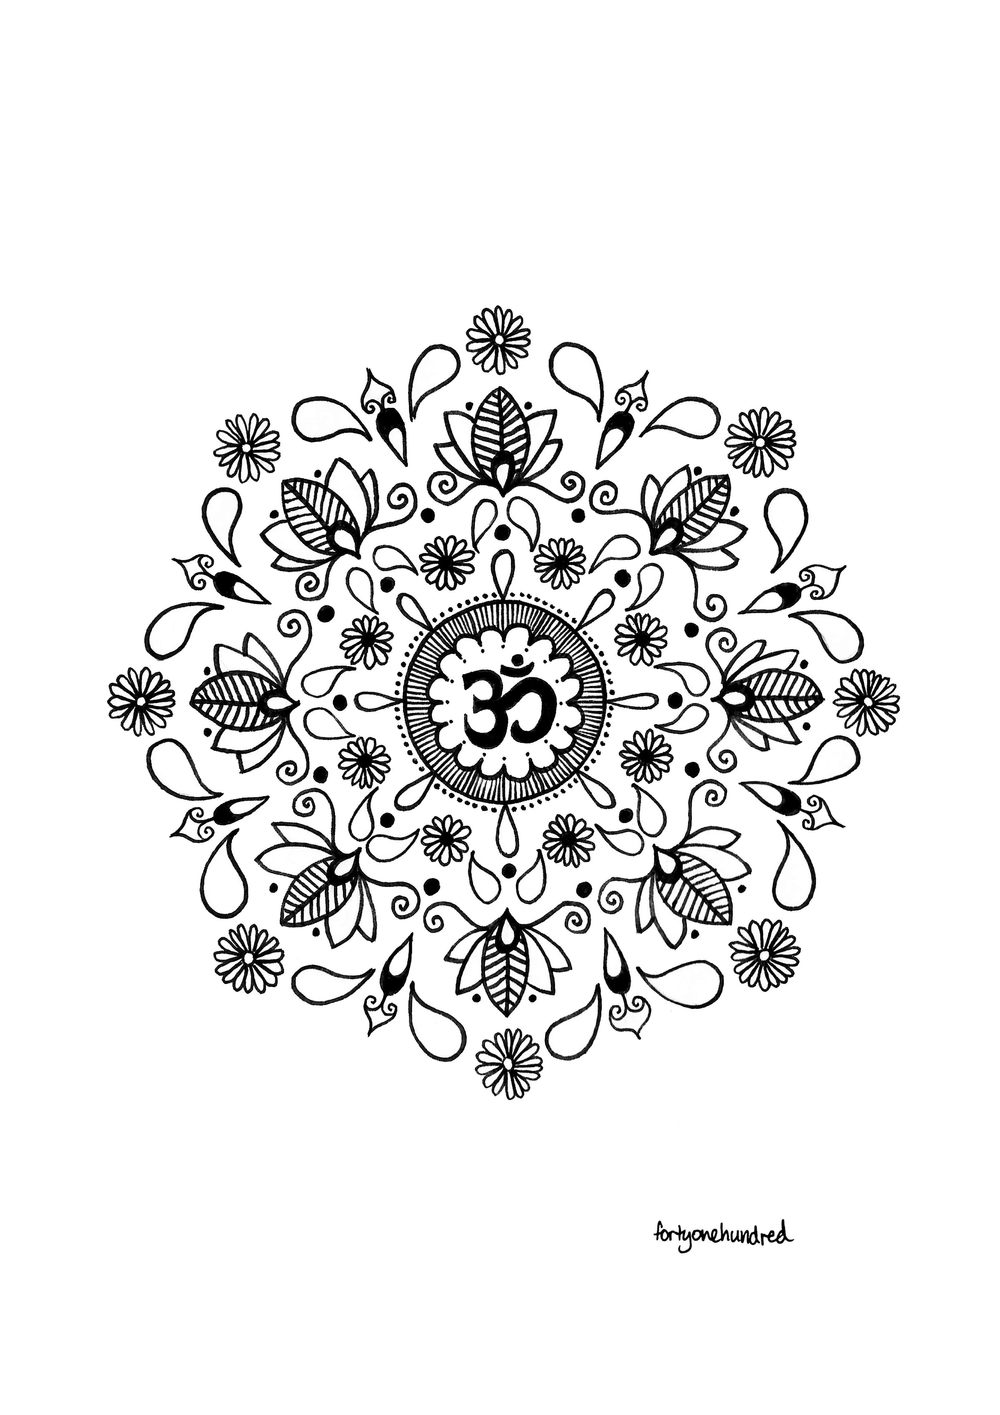 Exploded Floral Mandala.jpg